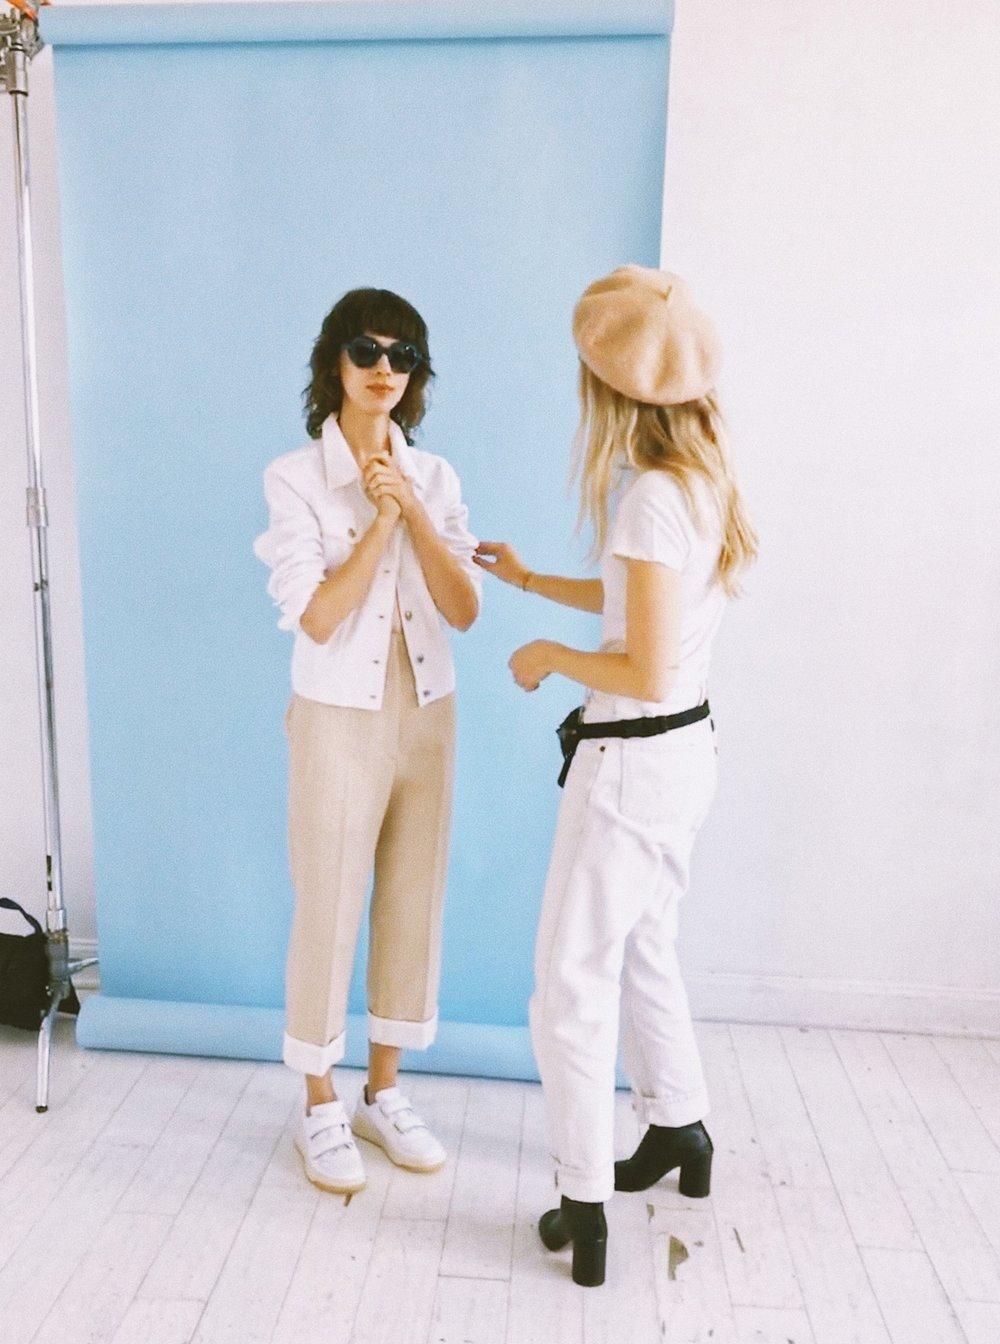 - Fashion stylist Email: Erica.M.Rosamilia@gmail.comPhone: + 248.207.7123LinkedIn:Erica RosamiliaInstagram: @ERICAROSAMILIACLIENTSwarp + WeftLowercase NYCBloomingdale'sDL1961URBAN OUTFITTERSESTEE LAUDERPac sun